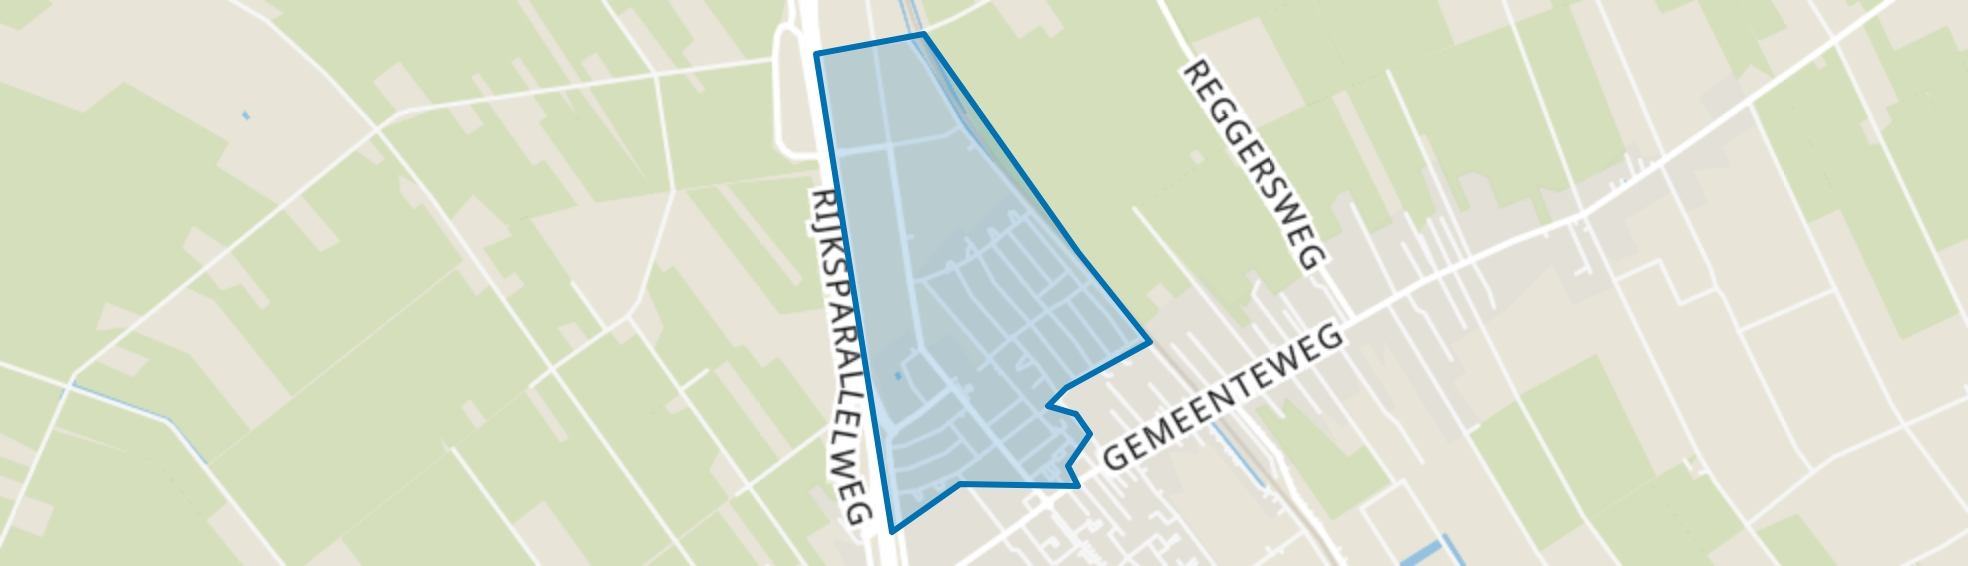 Staphorst-Noord, Staphorst map